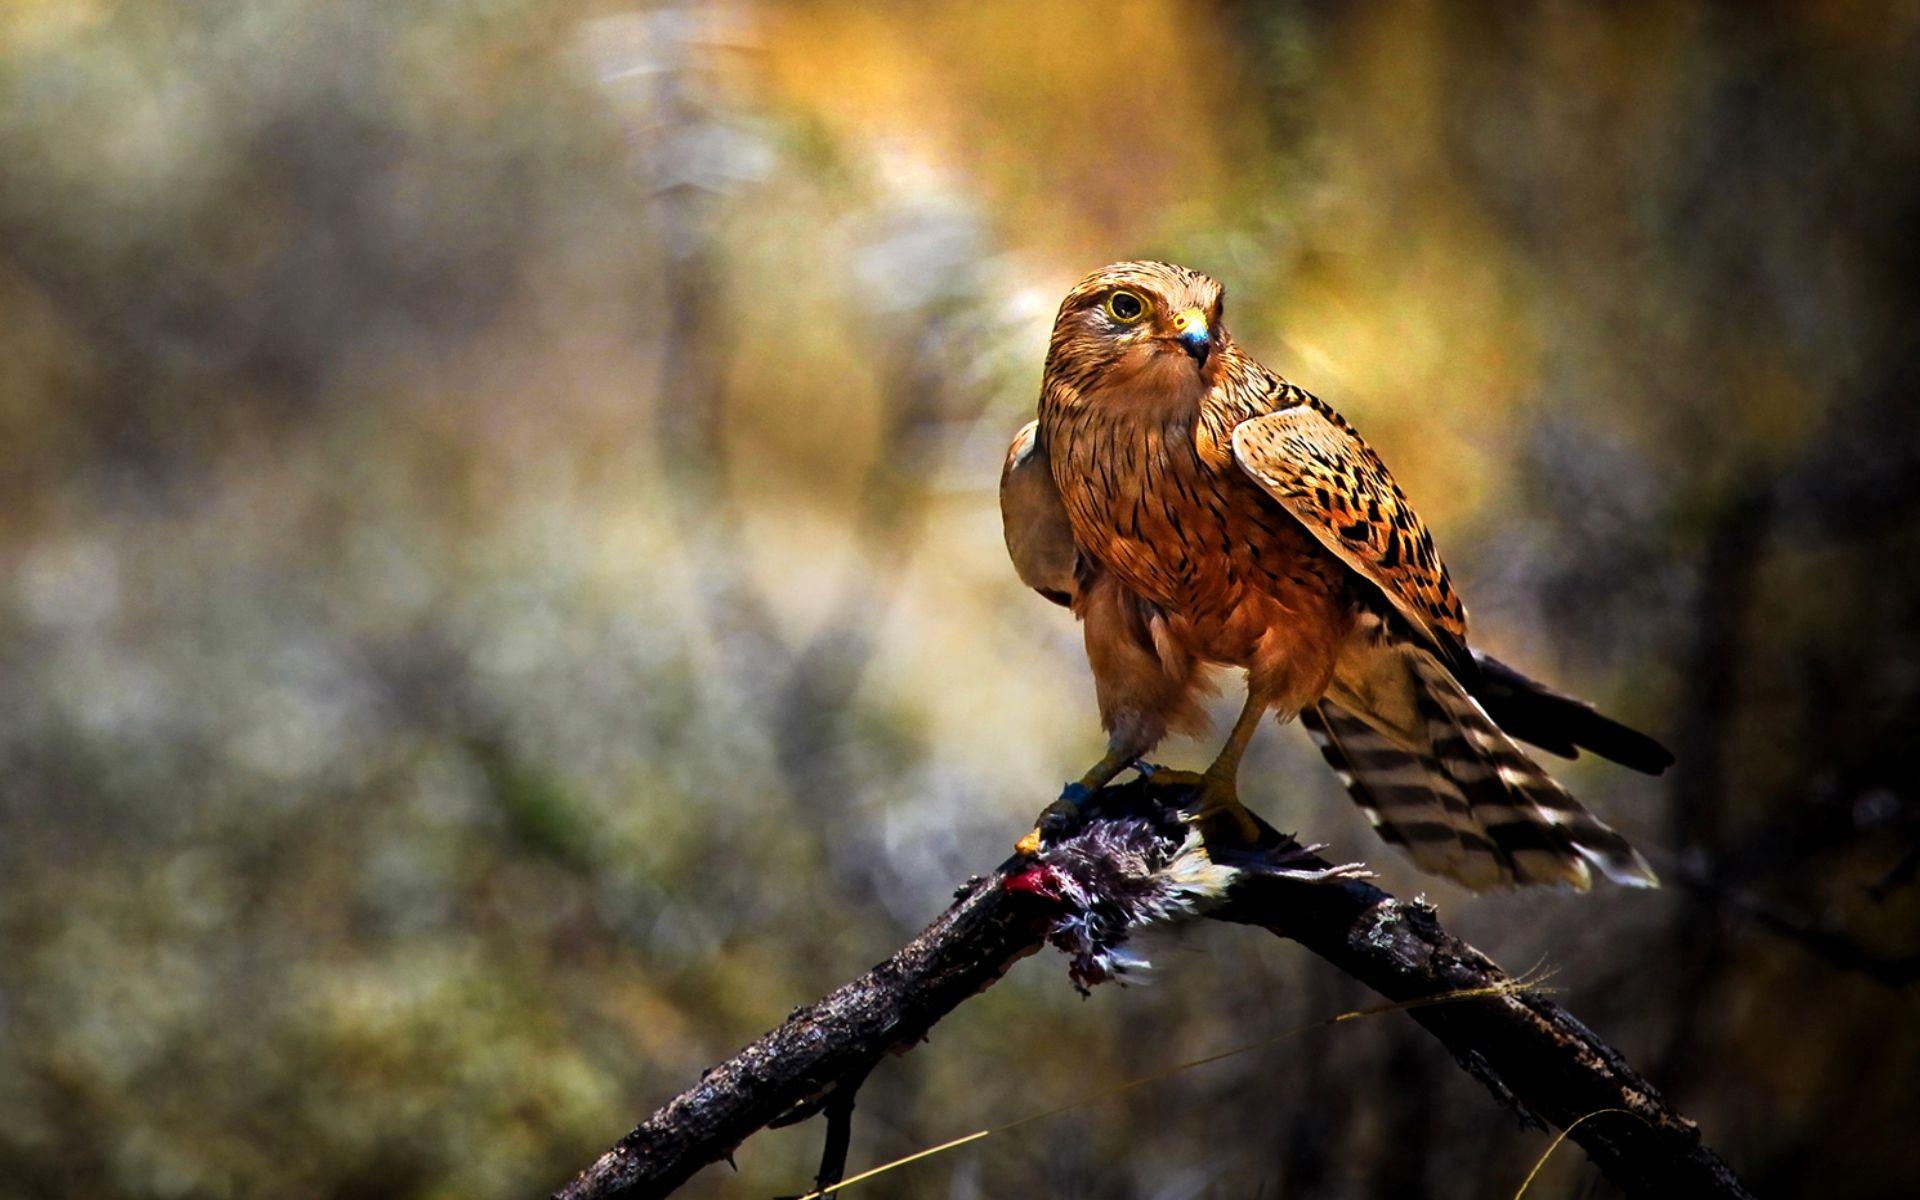 HD Bird Of Prey Wallpaper Download Free 110905 birds